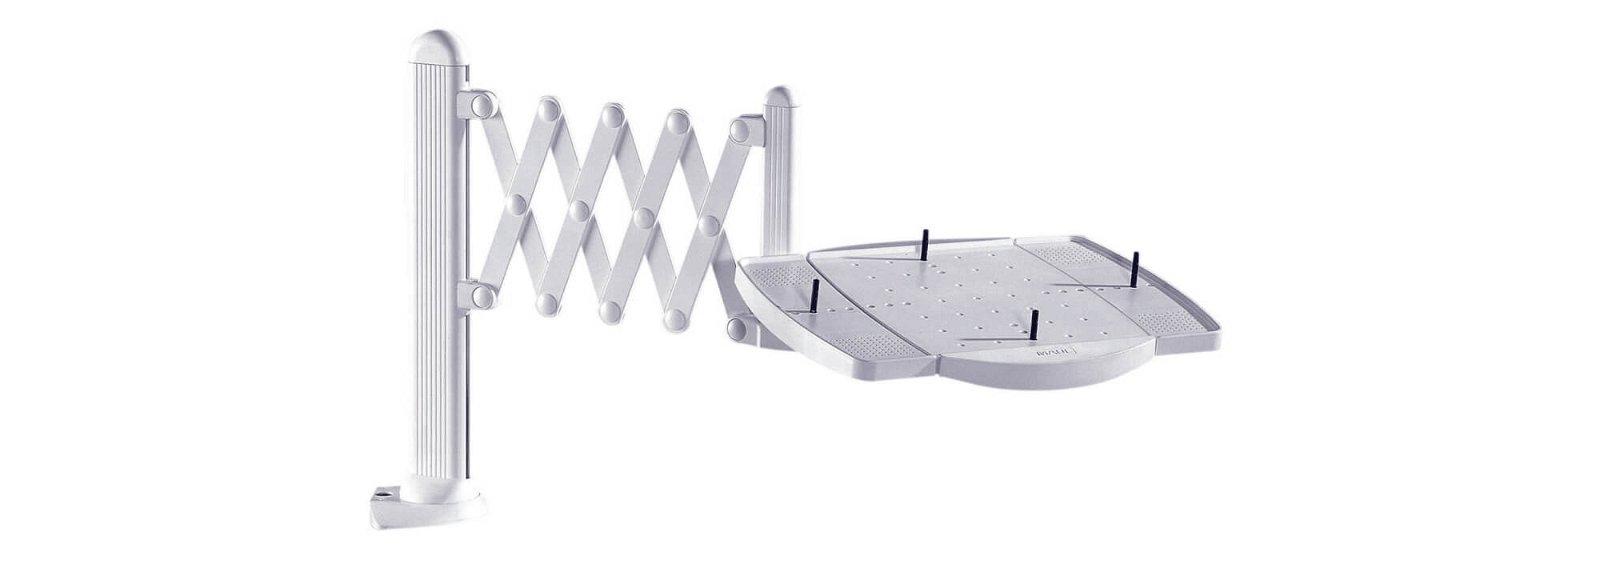 Telefon-Scherenarm elegant, mit Multifunktions-Platte, grau